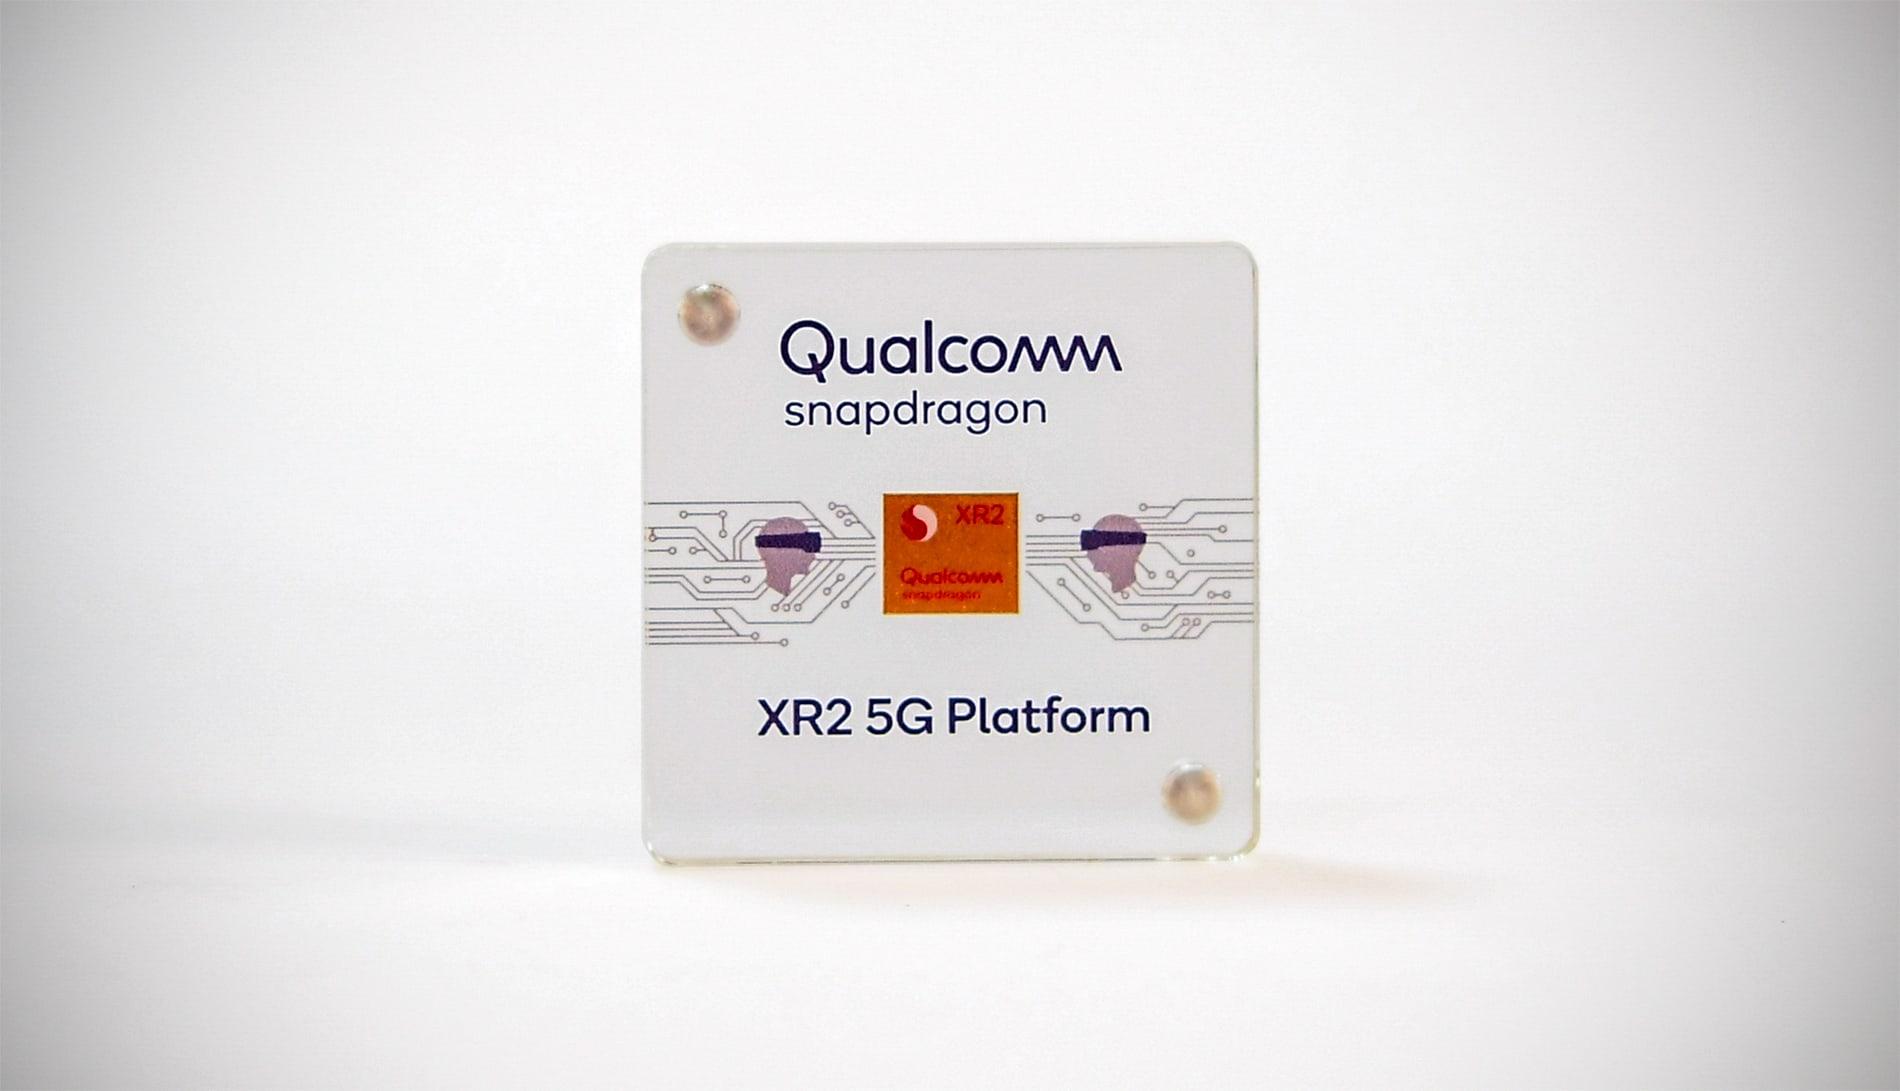 Qualcomm's new chipset promises better AR and VR anywhere